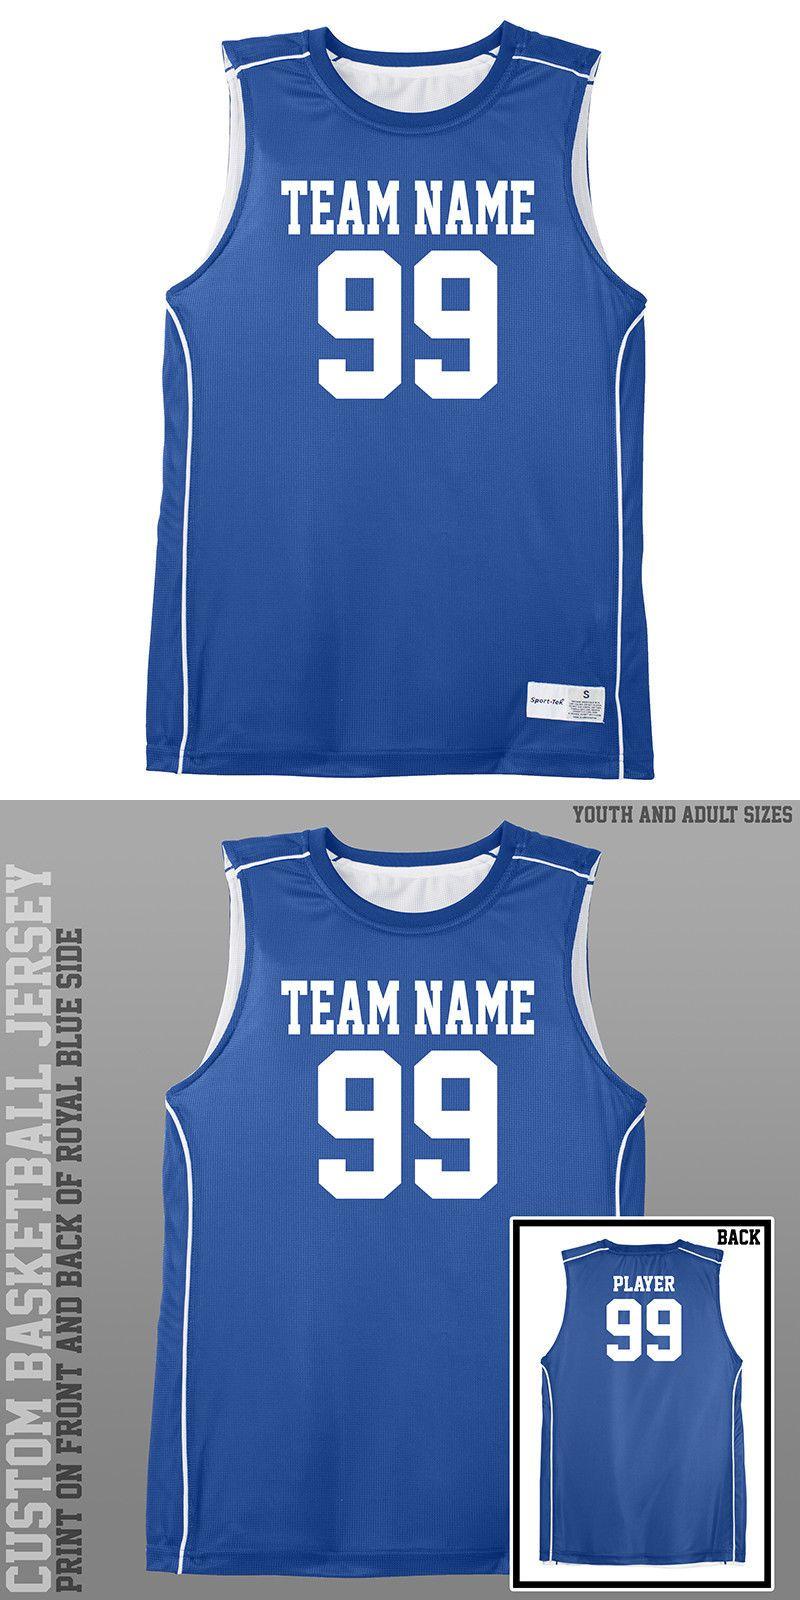 Clothing 158964  Custom Basketball Jersey Royal Blue Jersey Uniform  Sleeveless Sport Tek -  BUY IT NOW ONLY   39 on  eBay  clothing  custom   basketball ... c0a613a38